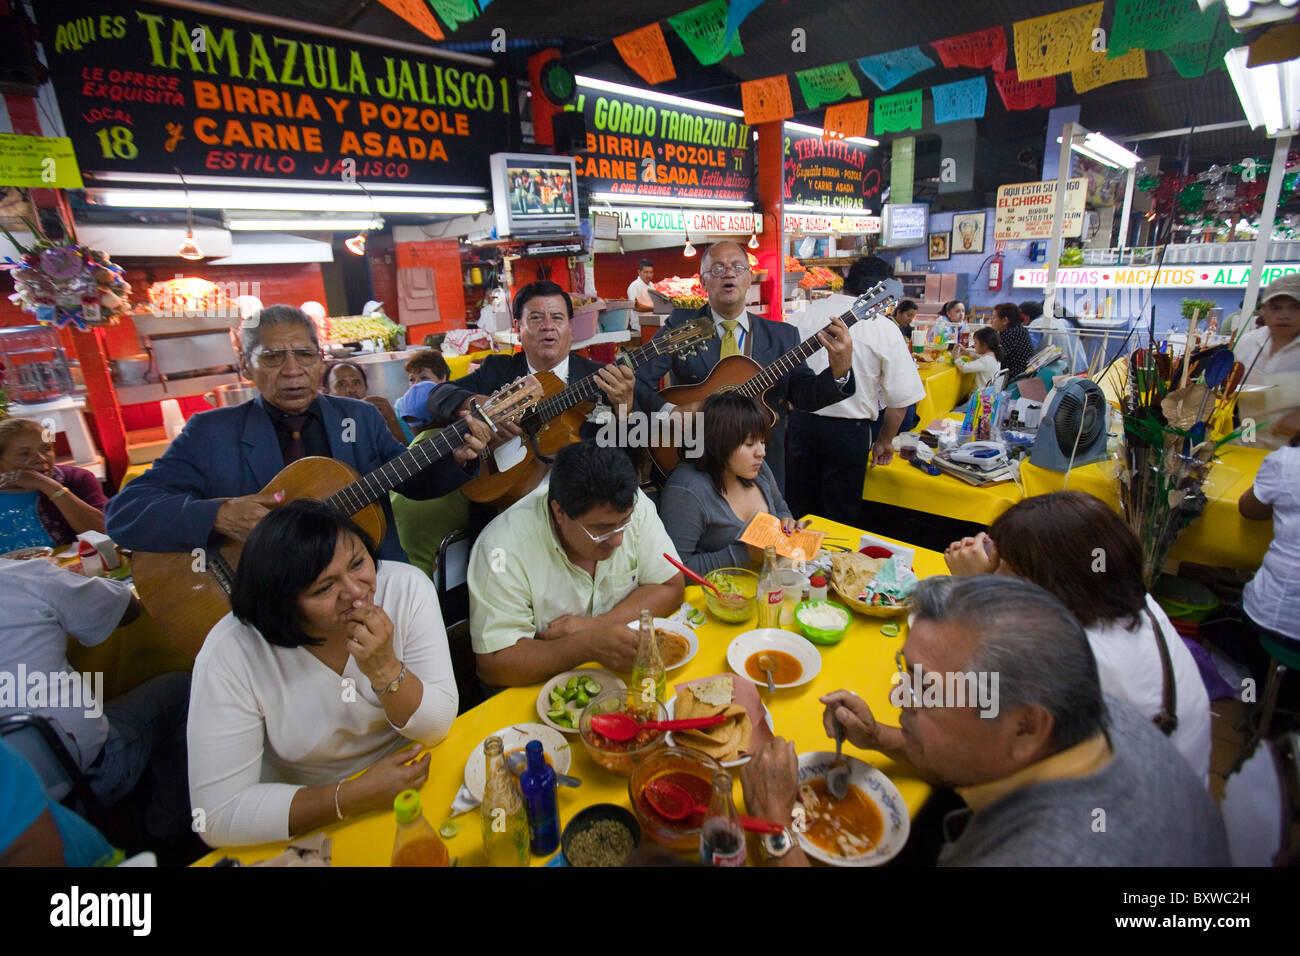 Plaza garibaldi restaurantes